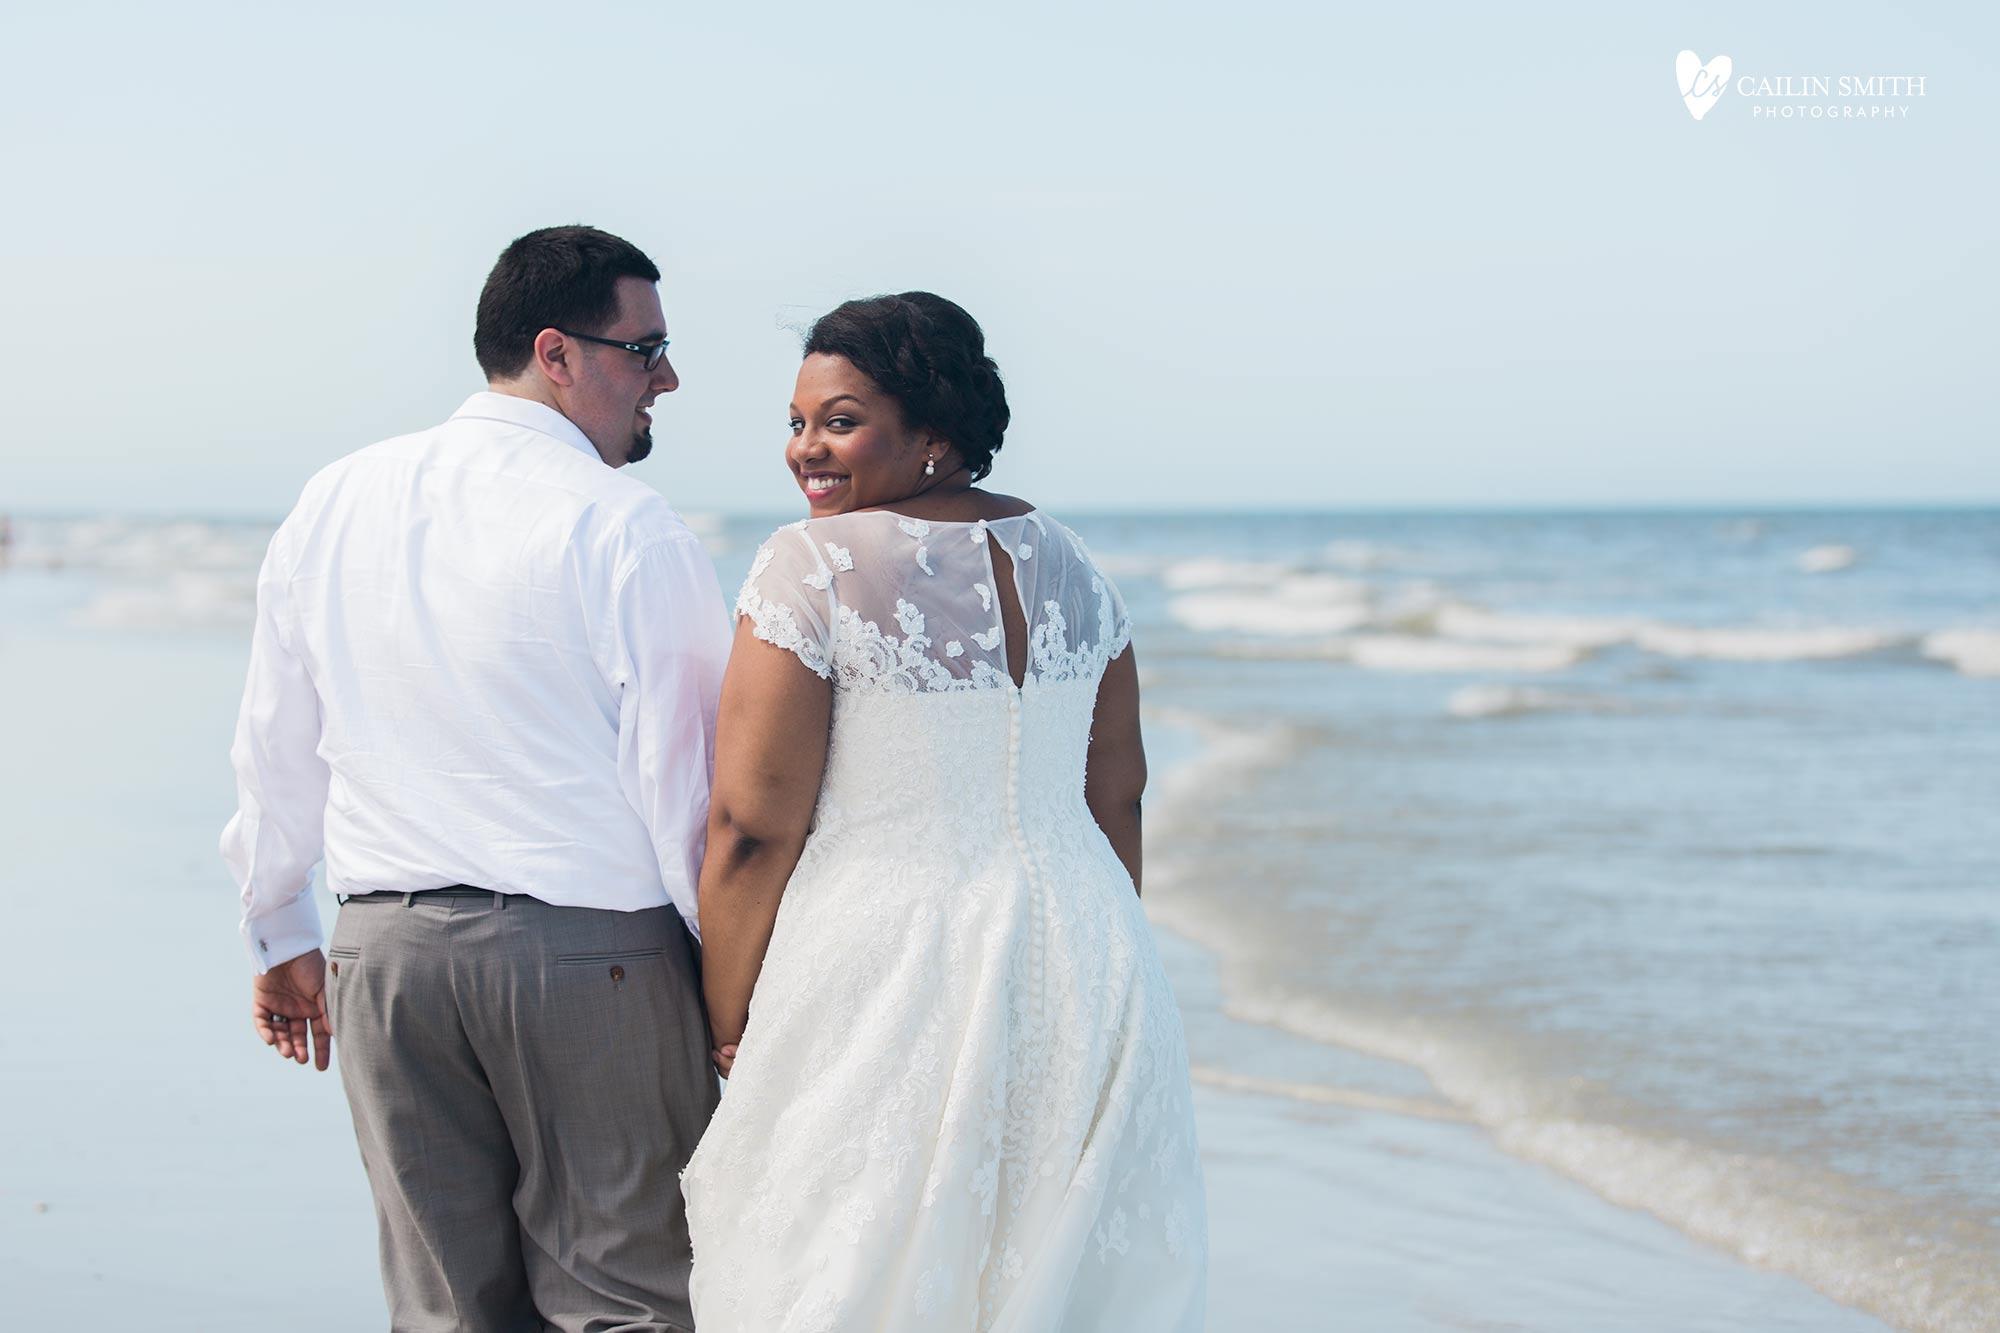 Danielle_Dave_One_Ocean_Wedding_Photography_Blog_090.jpg